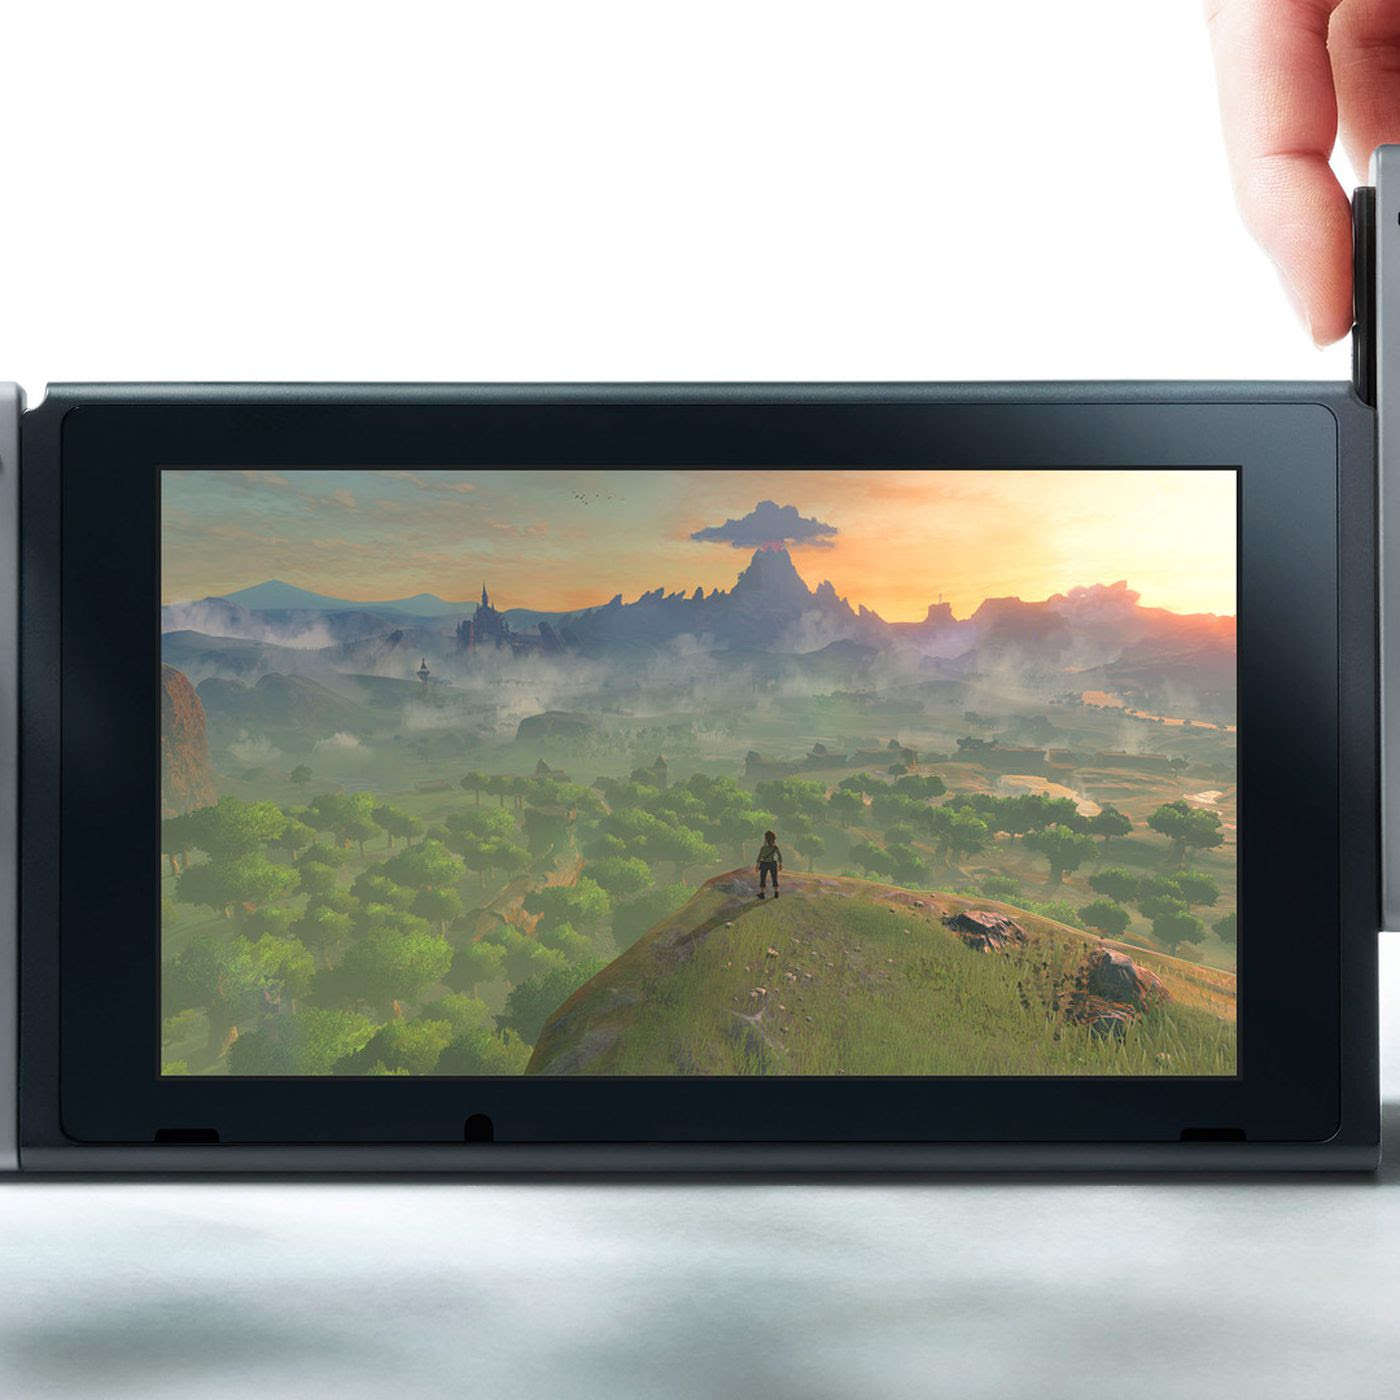 Nintendo Switch update enables Bluetooth audio pairing